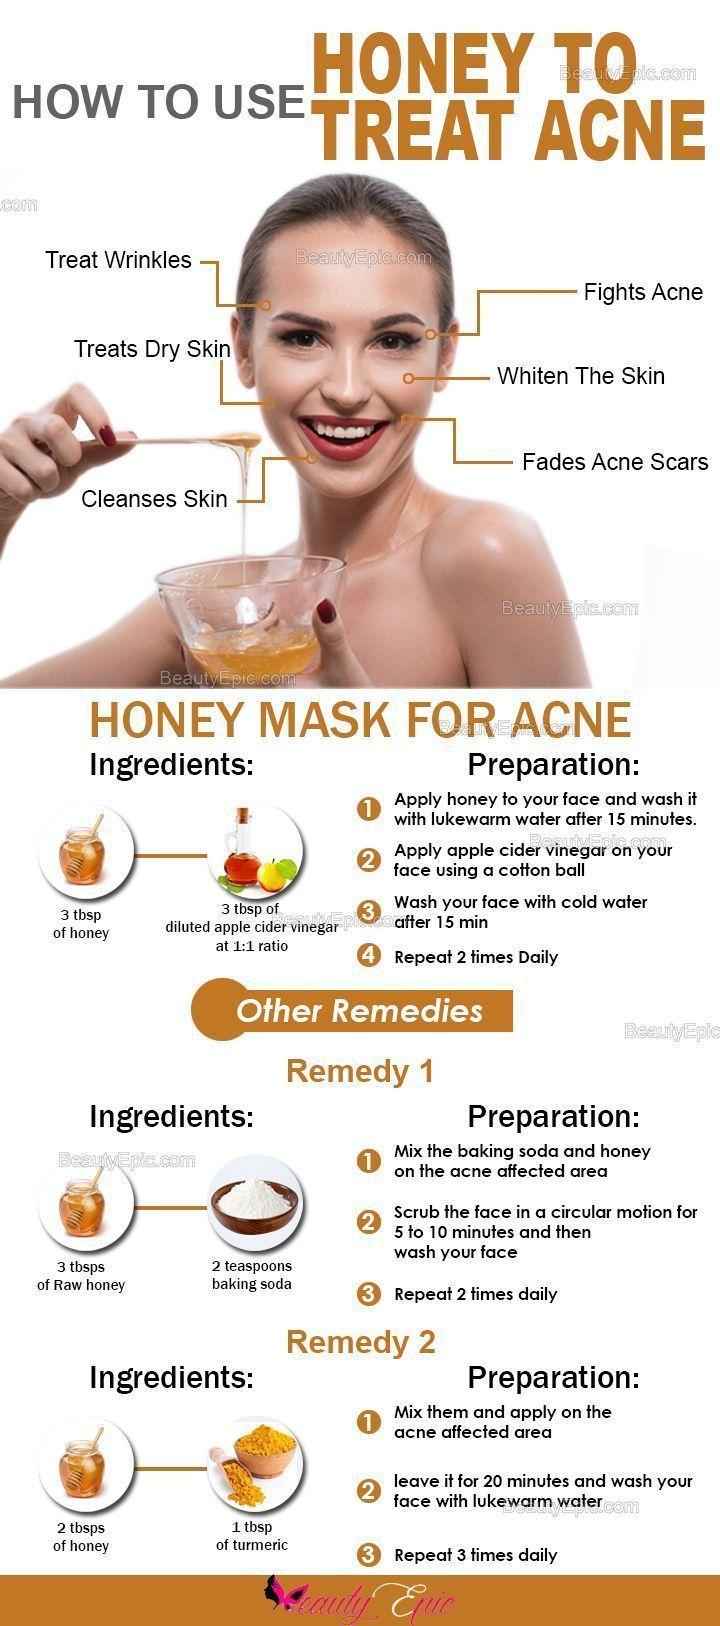 How to use Honey to Treat Acne